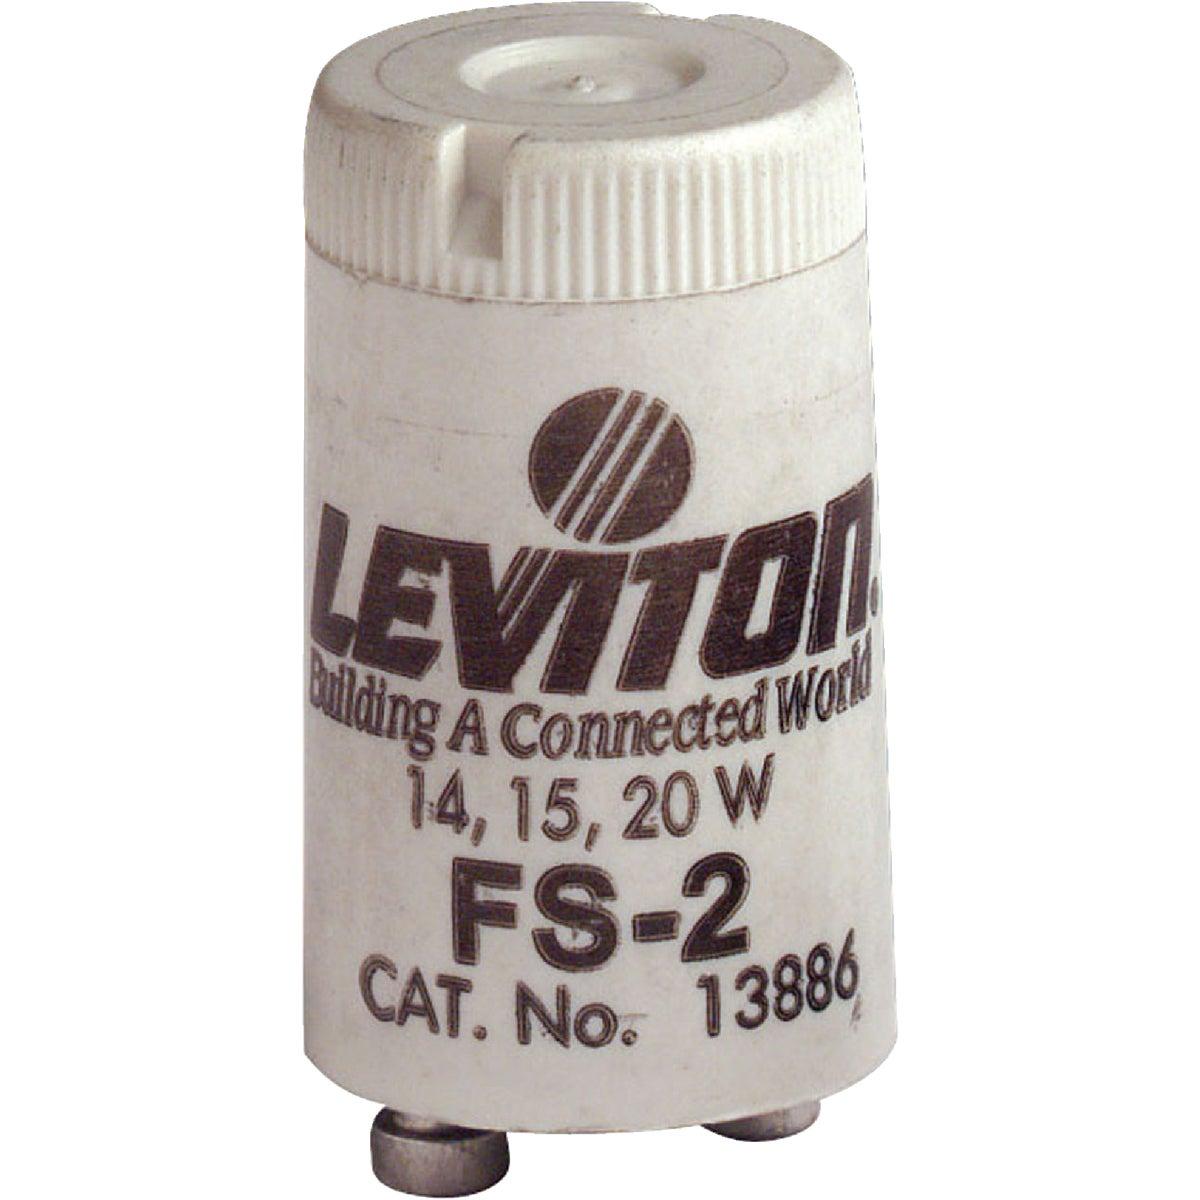 Leviton 14W/15W/20W 2-Pin T8 Fluorescent Starter